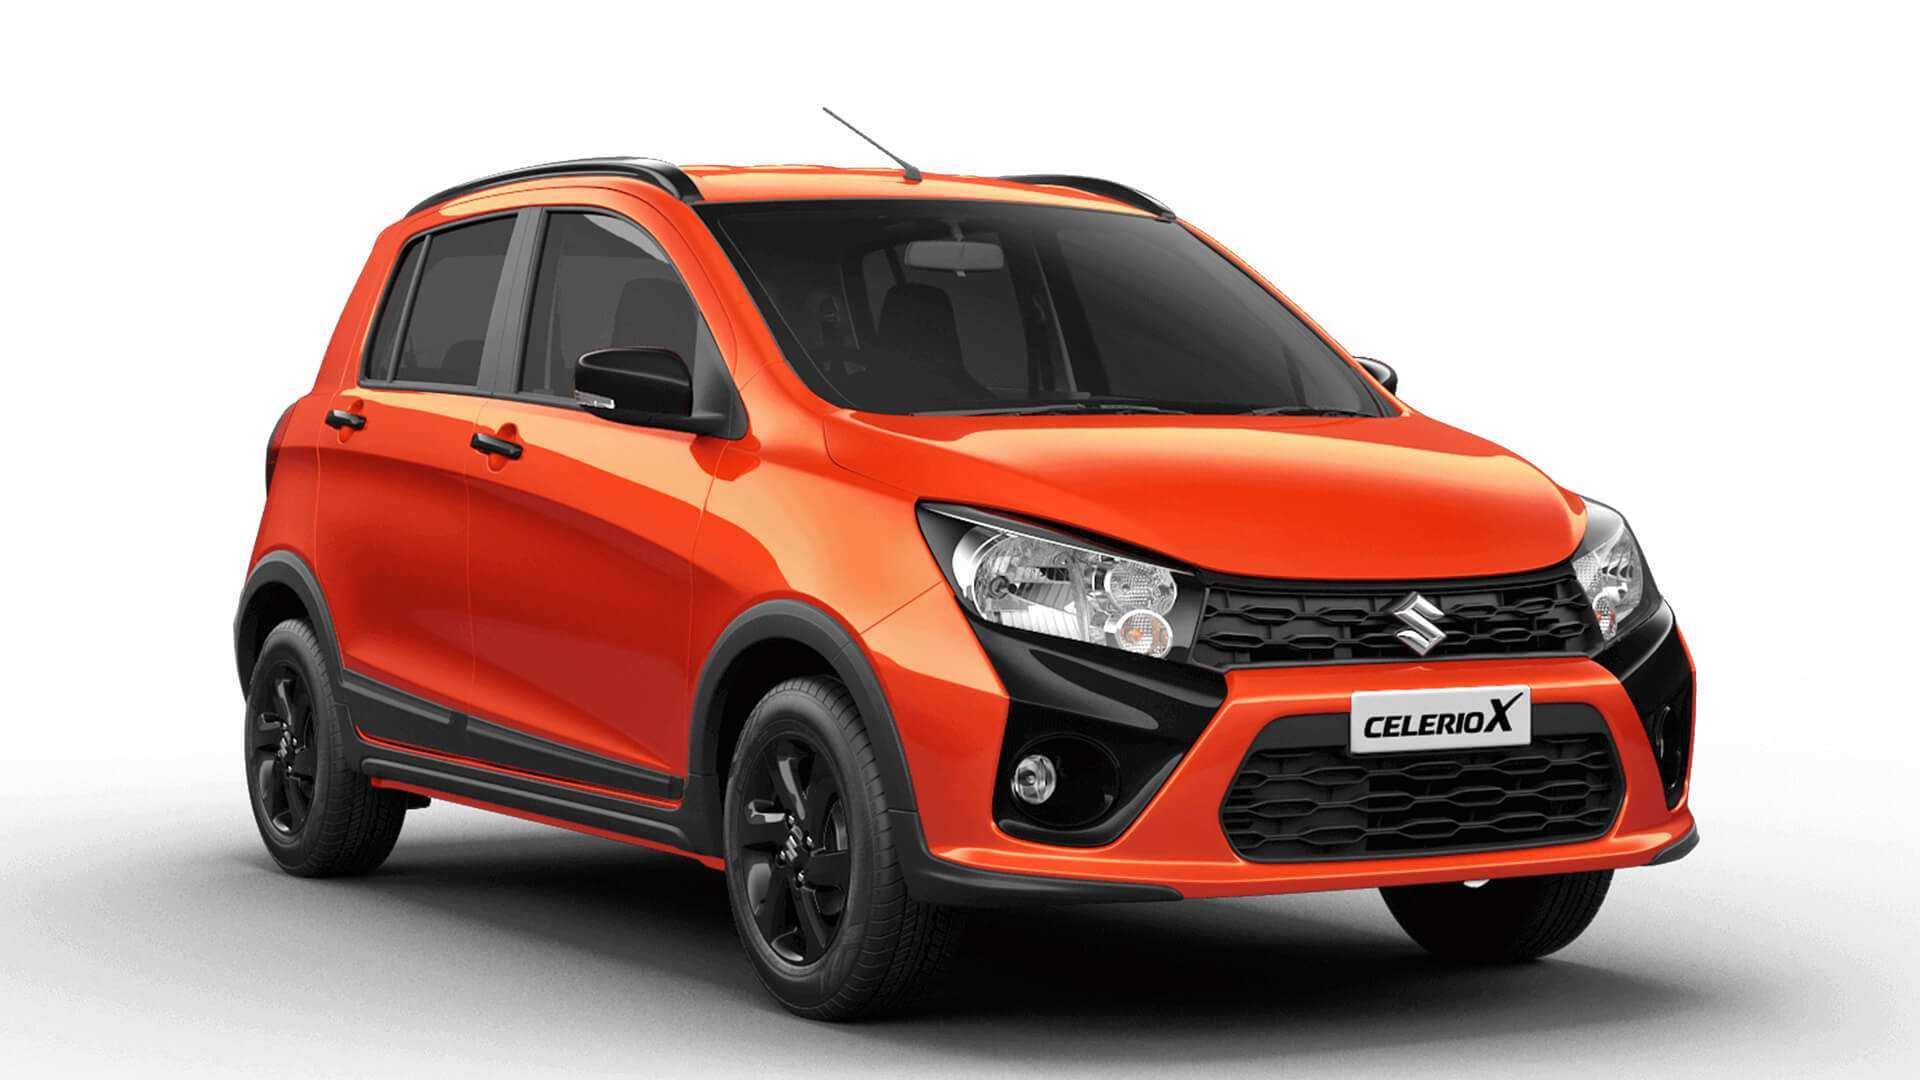 65 All New Suzuki Cars 2020 Reviews with Suzuki Cars 2020